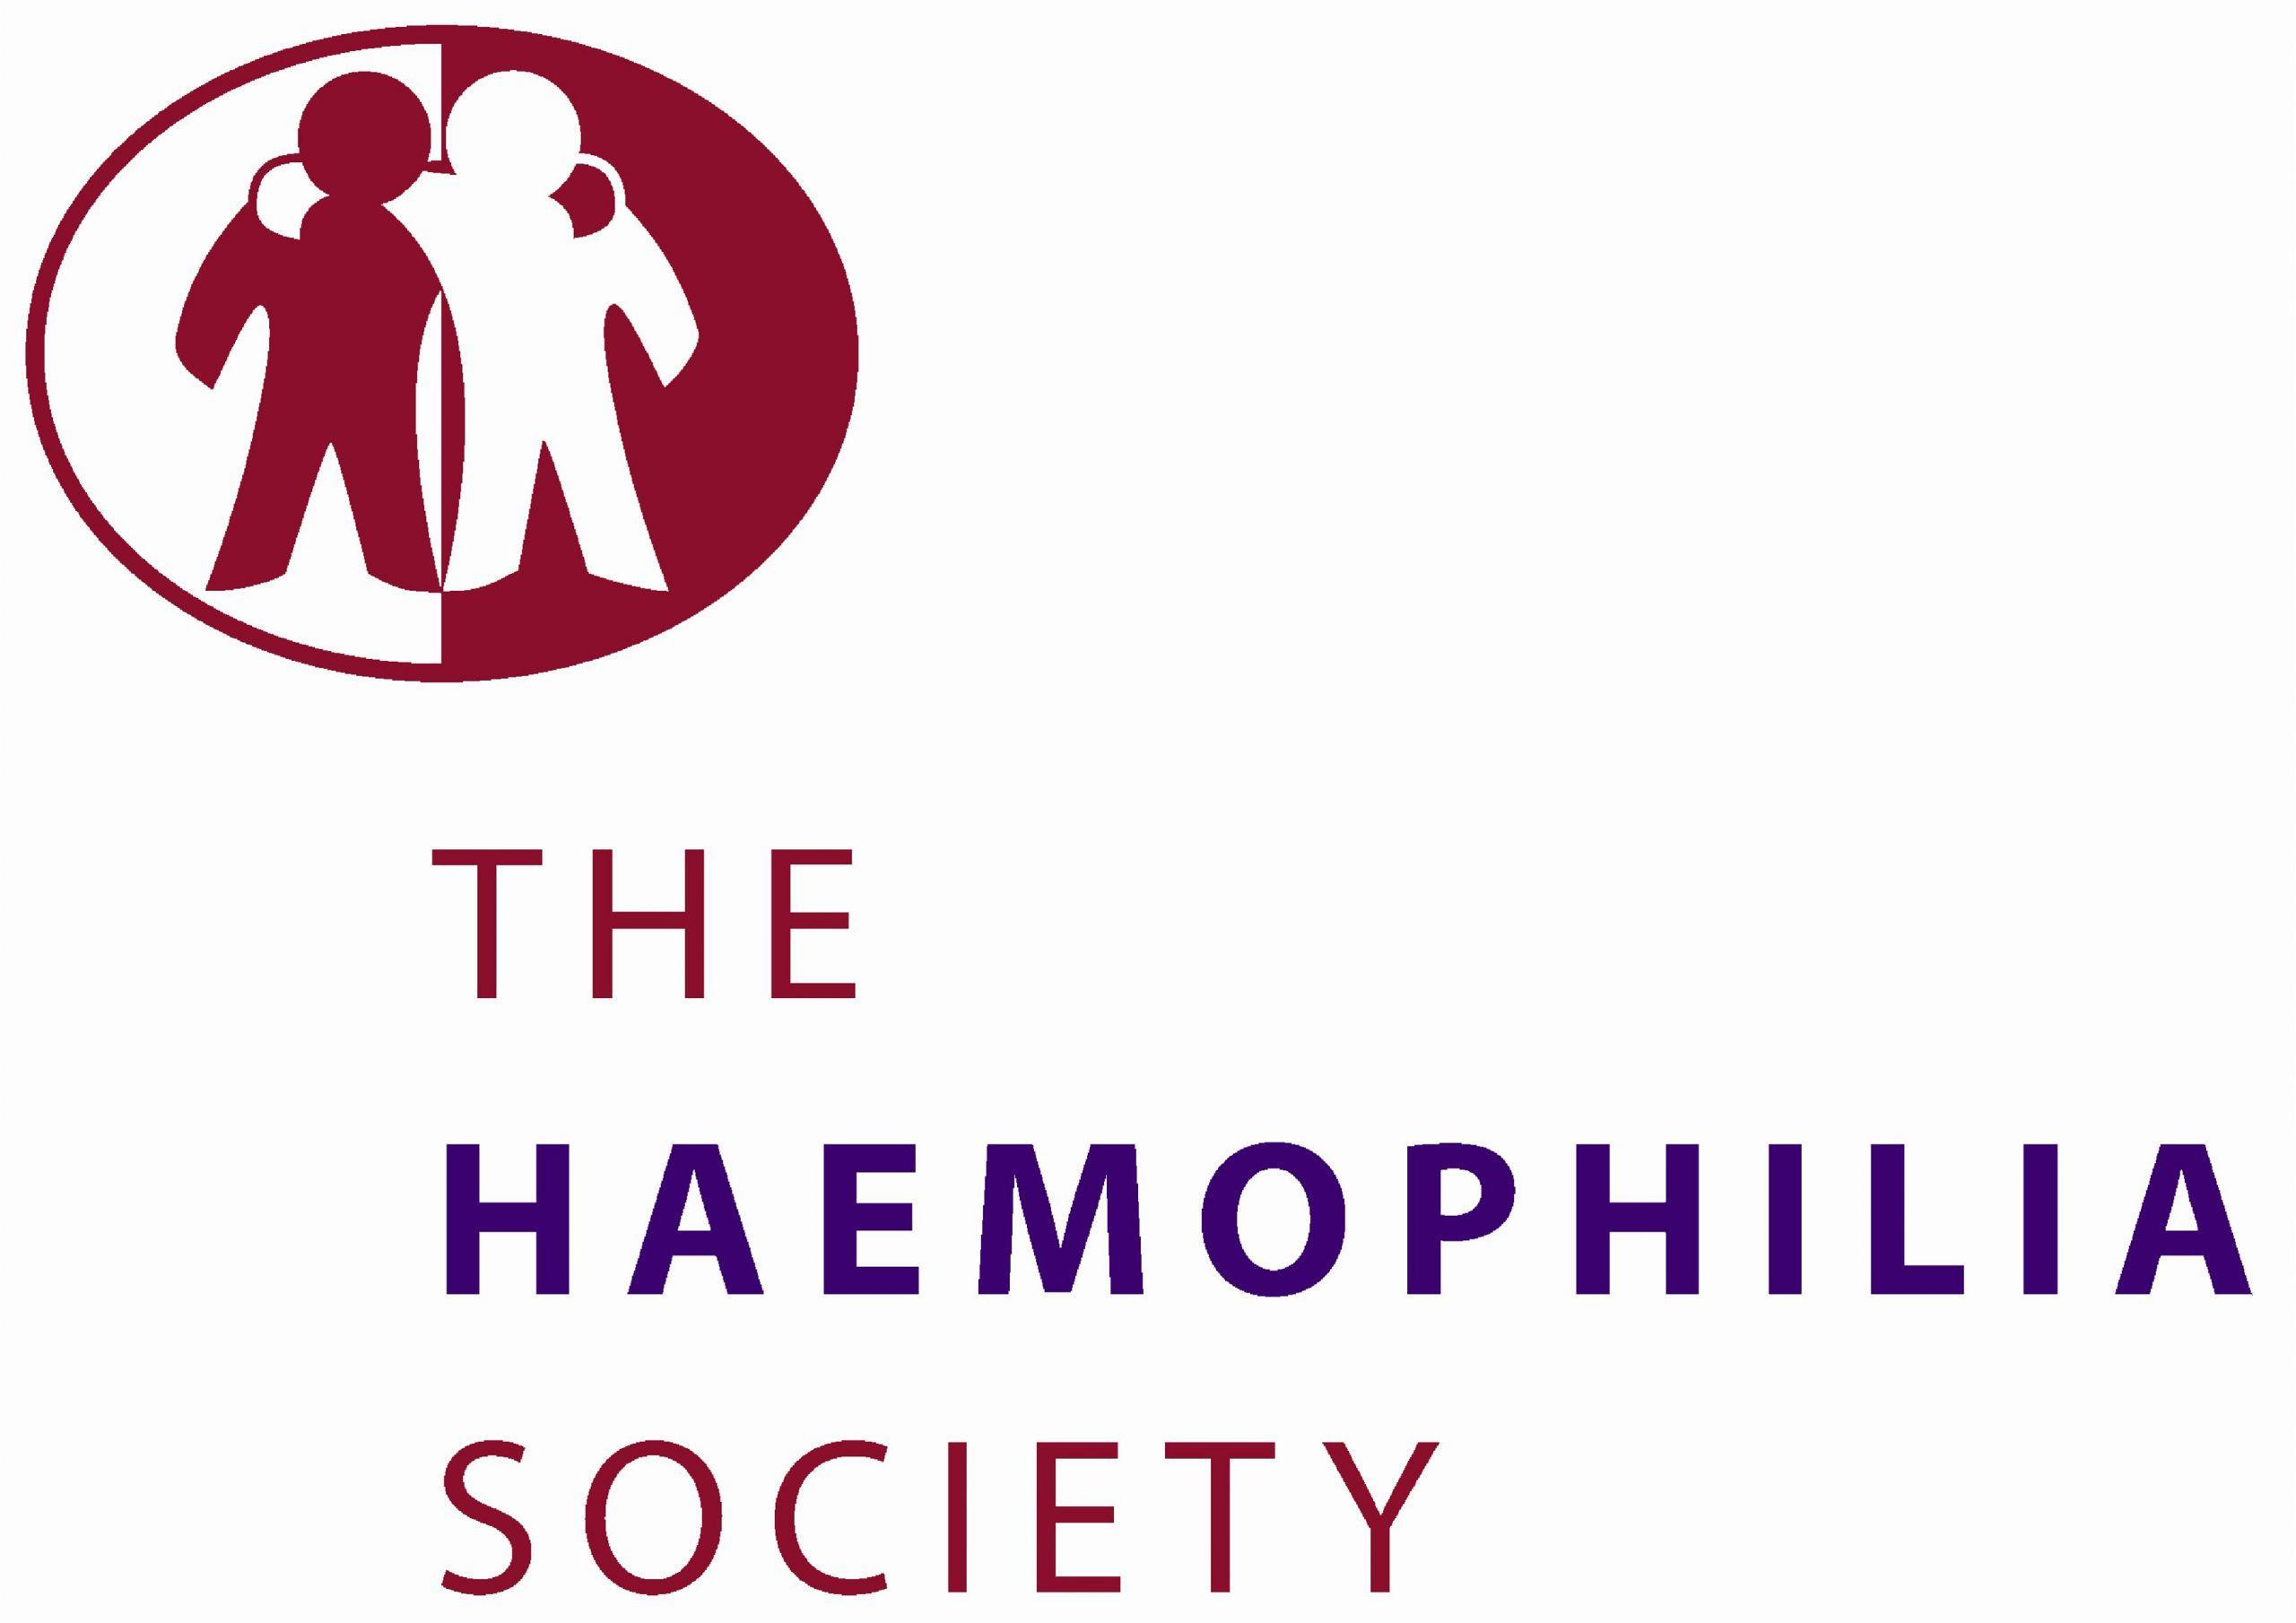 The Haemophilia Society endorse HBDCA